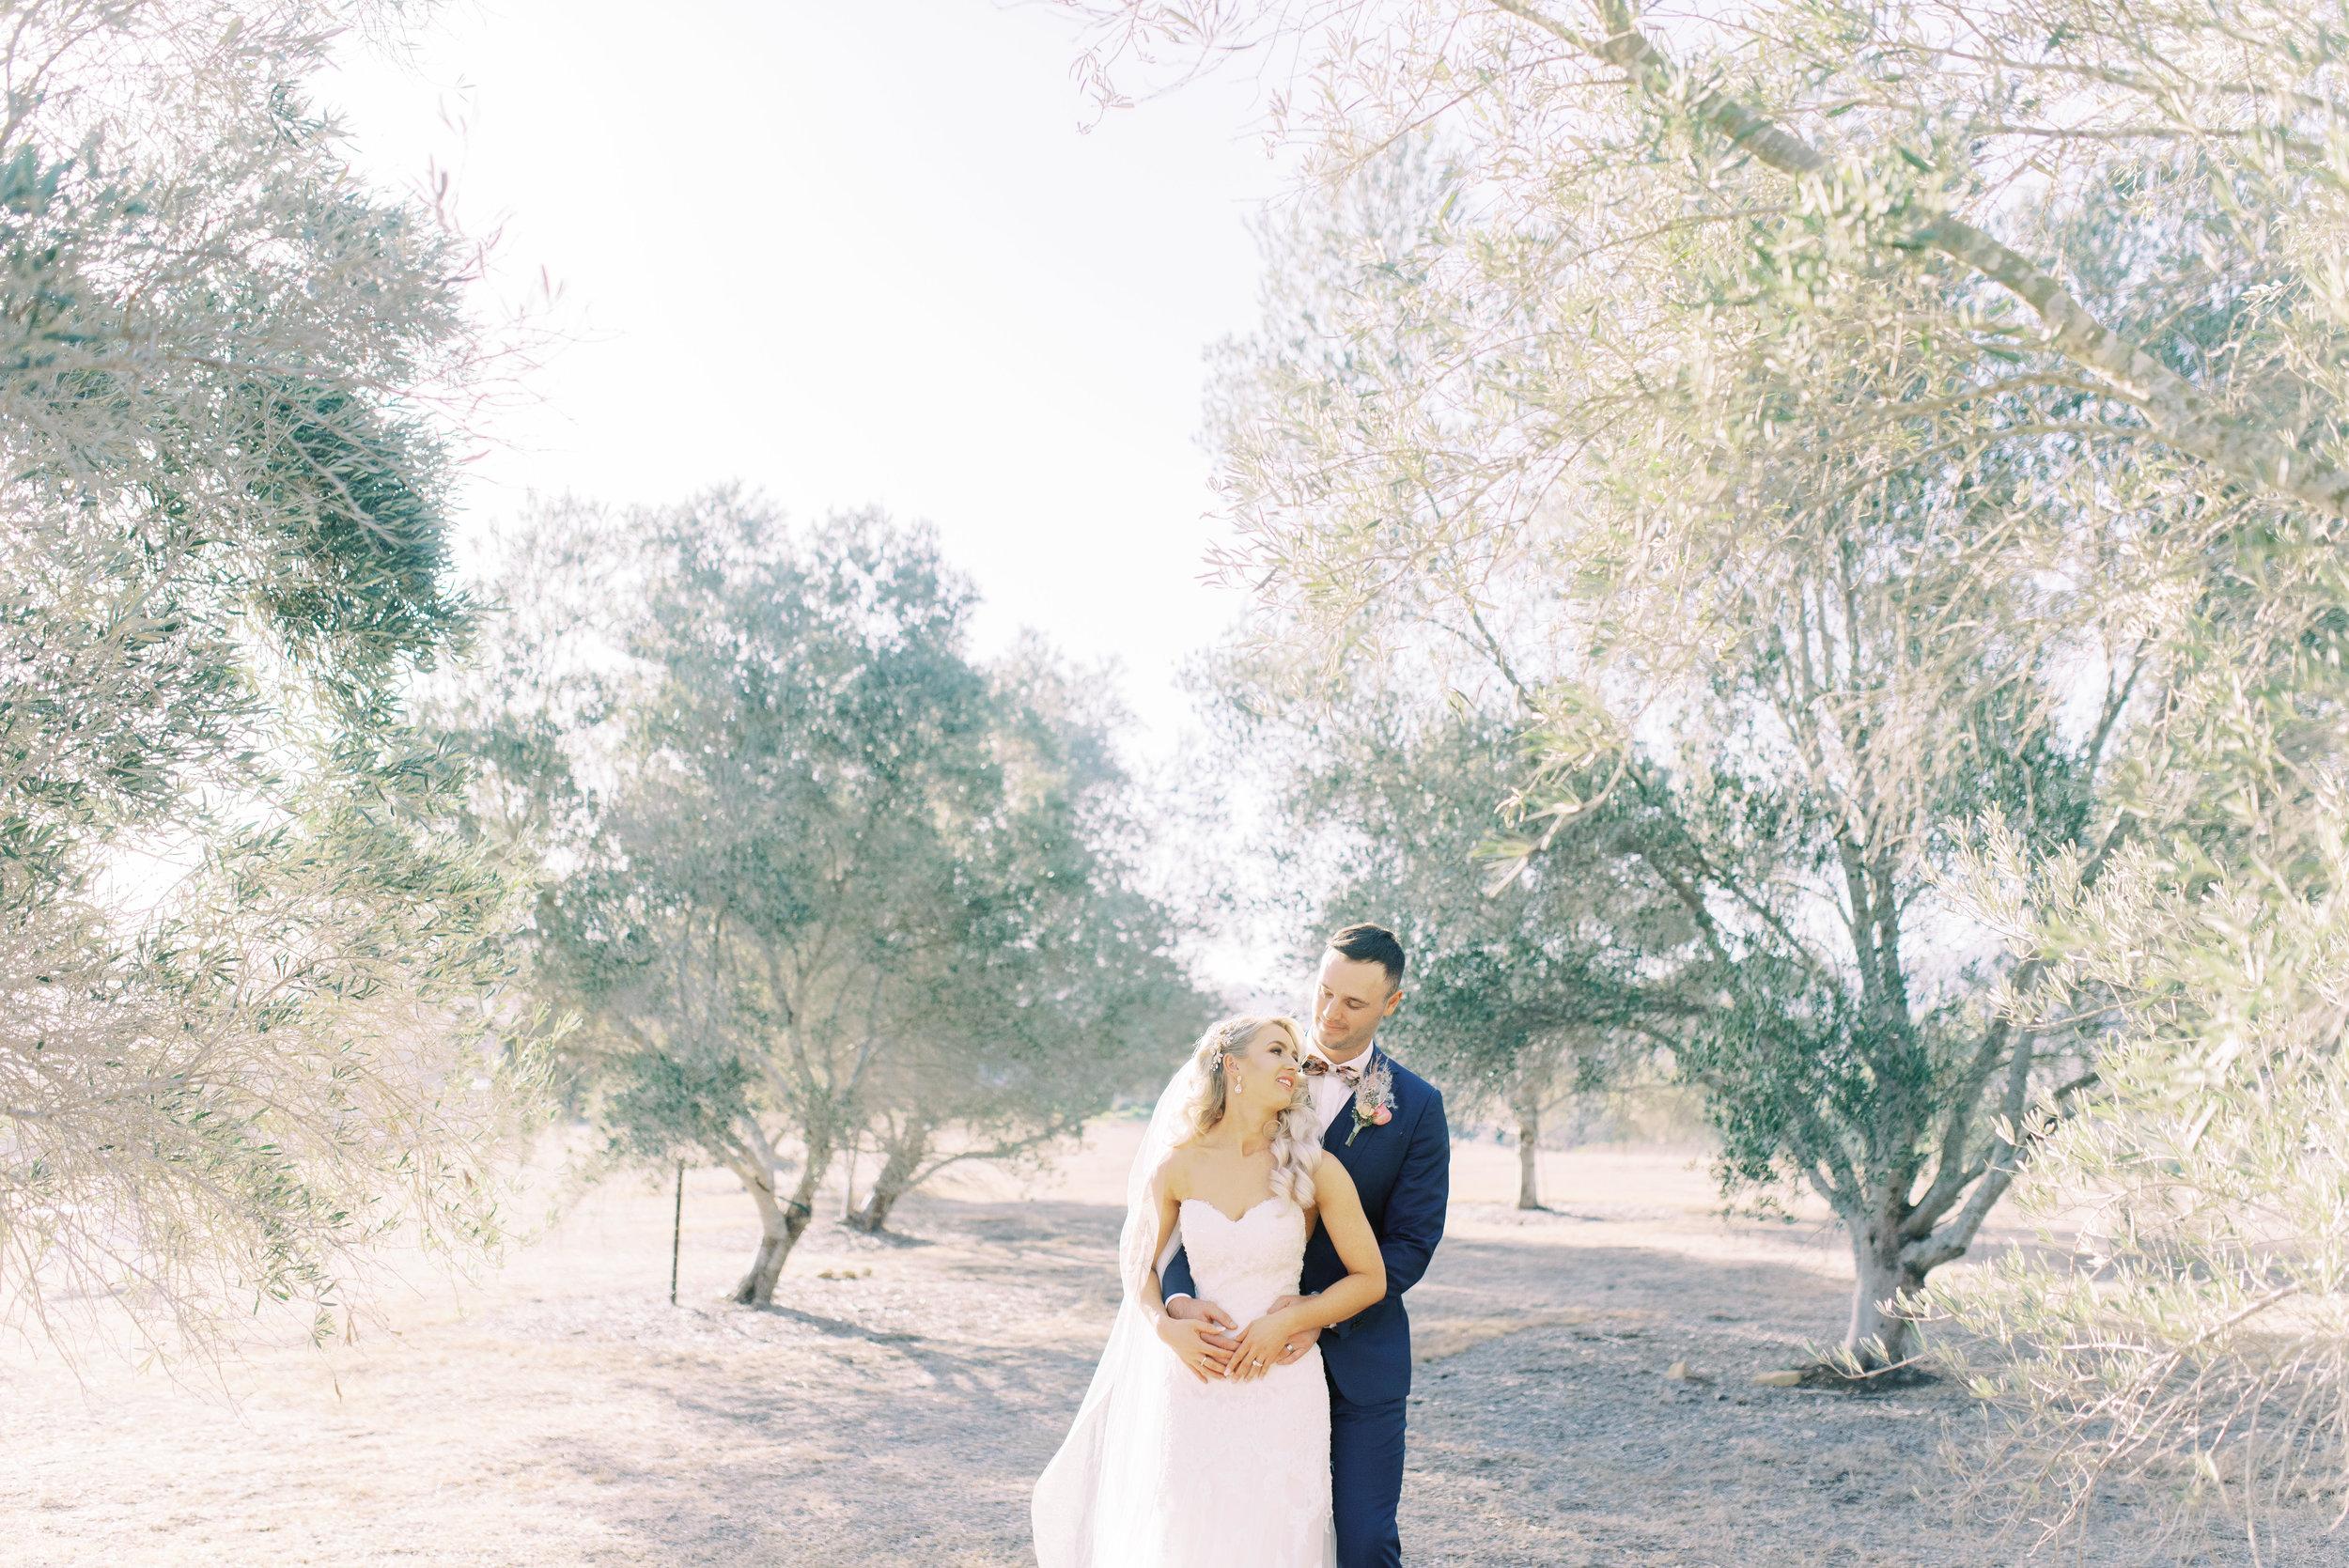 Kooroomba-Vineyard-Lavender-Farm-Wedding-Fine-Art-Lauren-Olivia-58.jpg